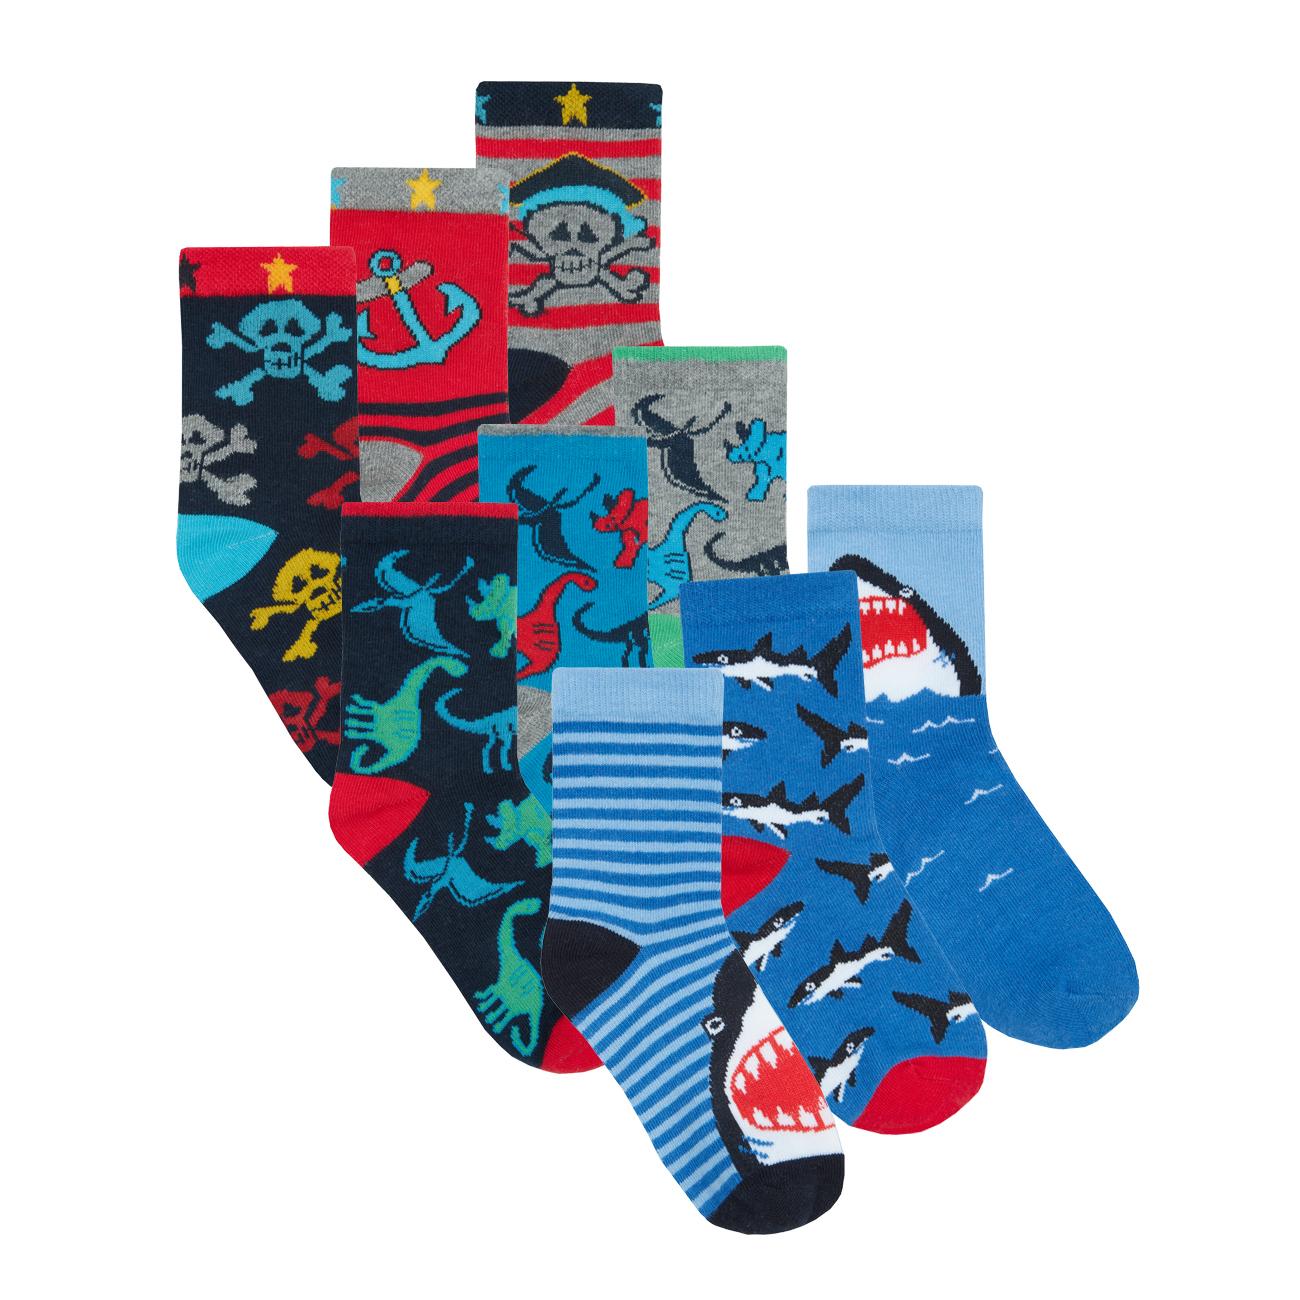 Metzuyan Baby Boys 6 Pairs Novelty Print Cotton Rich Multibuy Ankle Socks